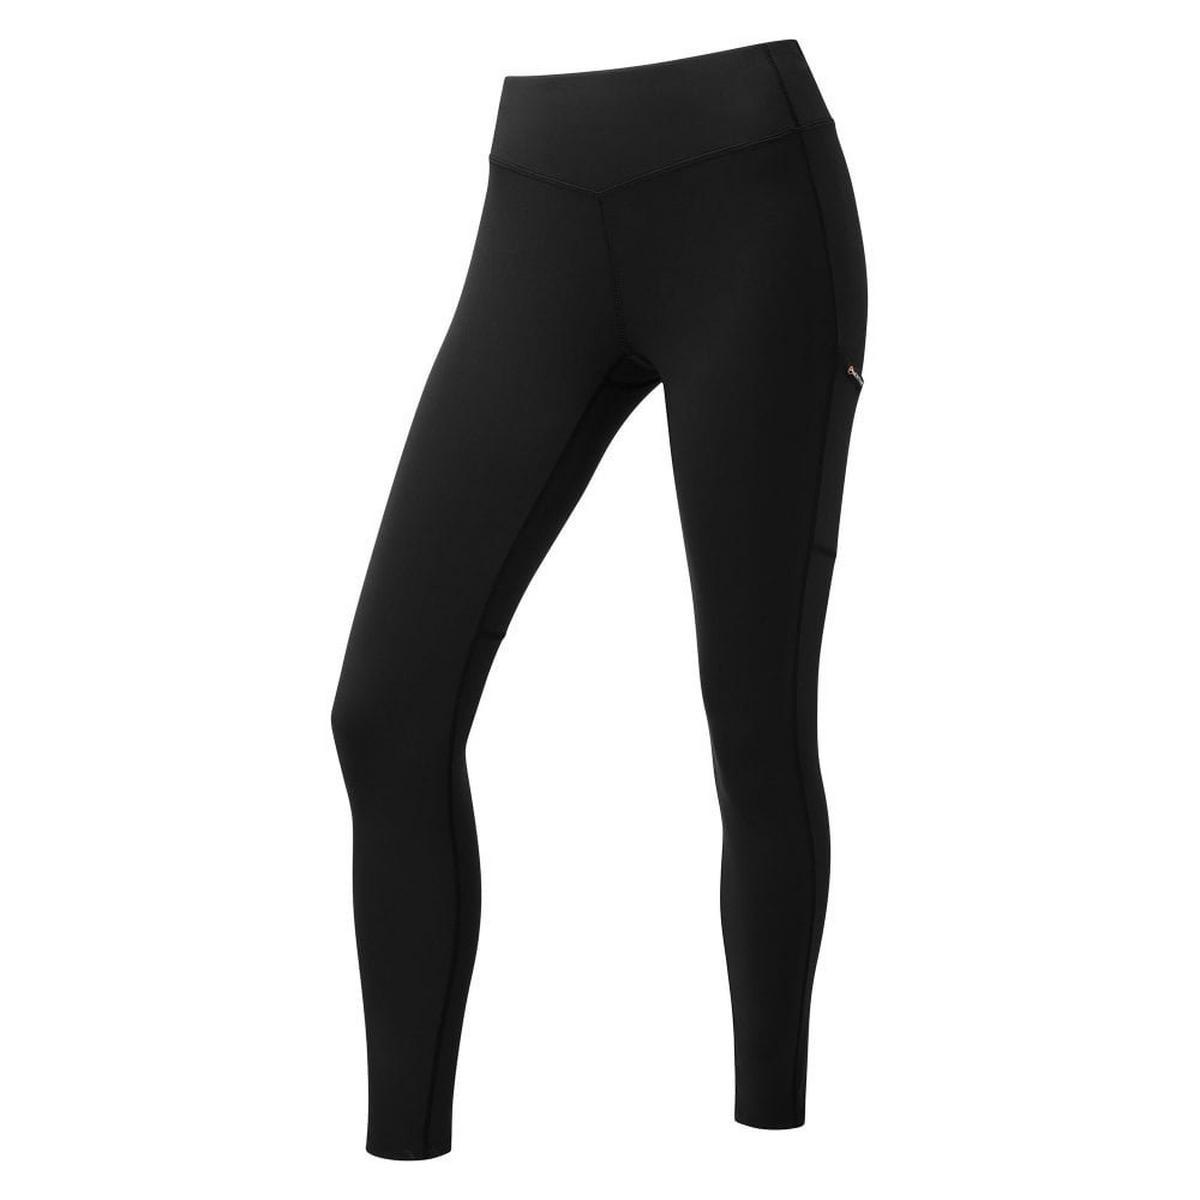 Montane Pant Women's Ineo Pro REGULAR Leg Trousers Black